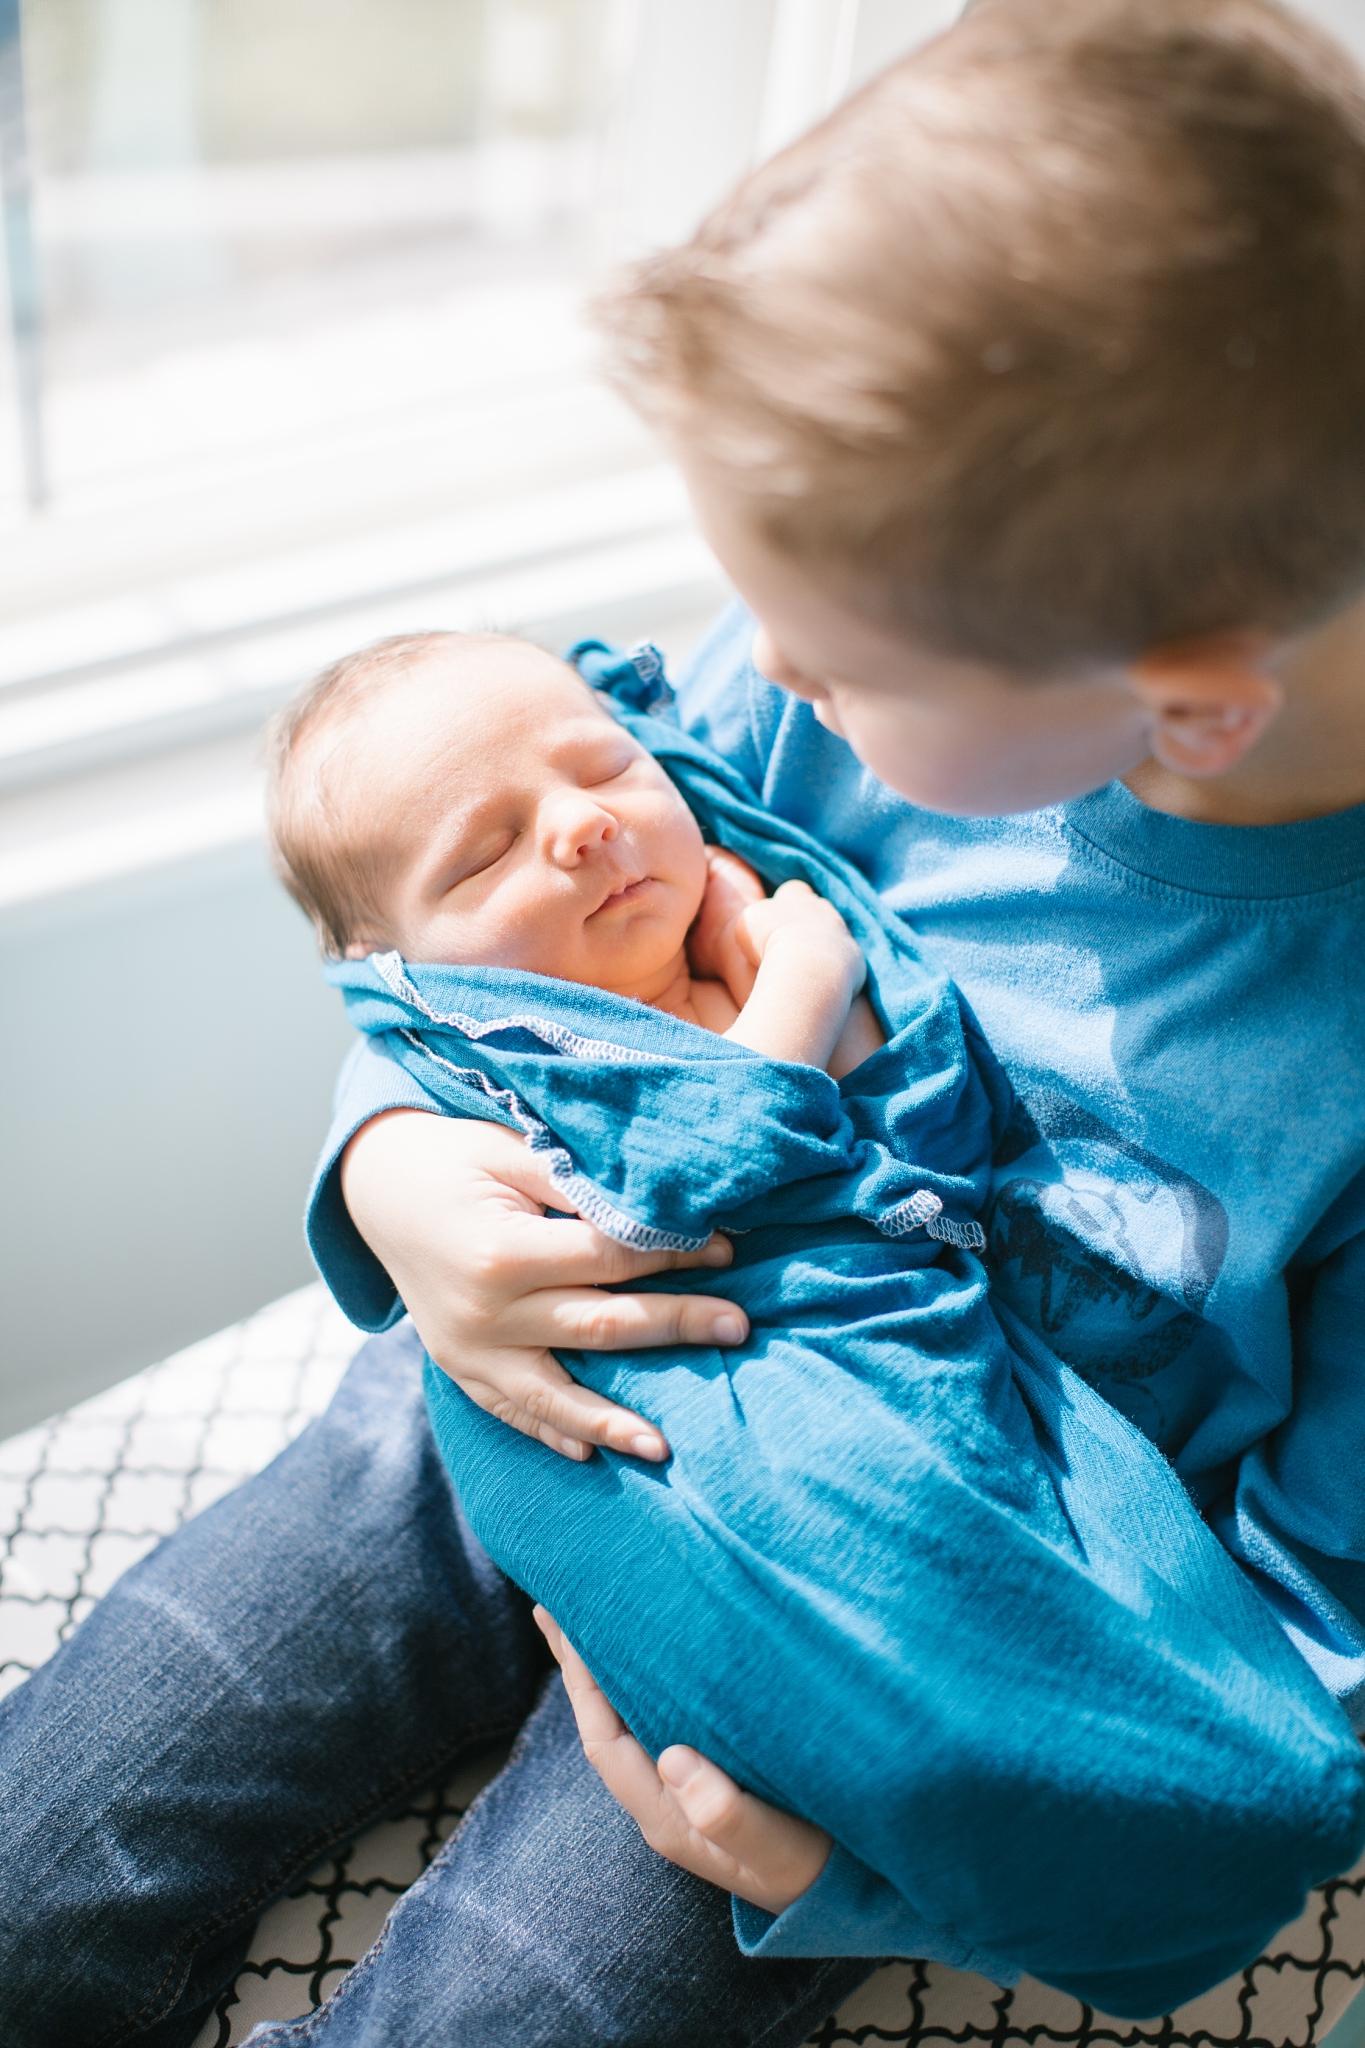 Marcus-40_Lizzie-B-Imagery-Utah-Family-Photographer-Lifestyle-Home-Photography-Salt-Lake-City-Park-City-Utah-County-Provo-Newborn-Photographer-Fresh-48-Session.jpg